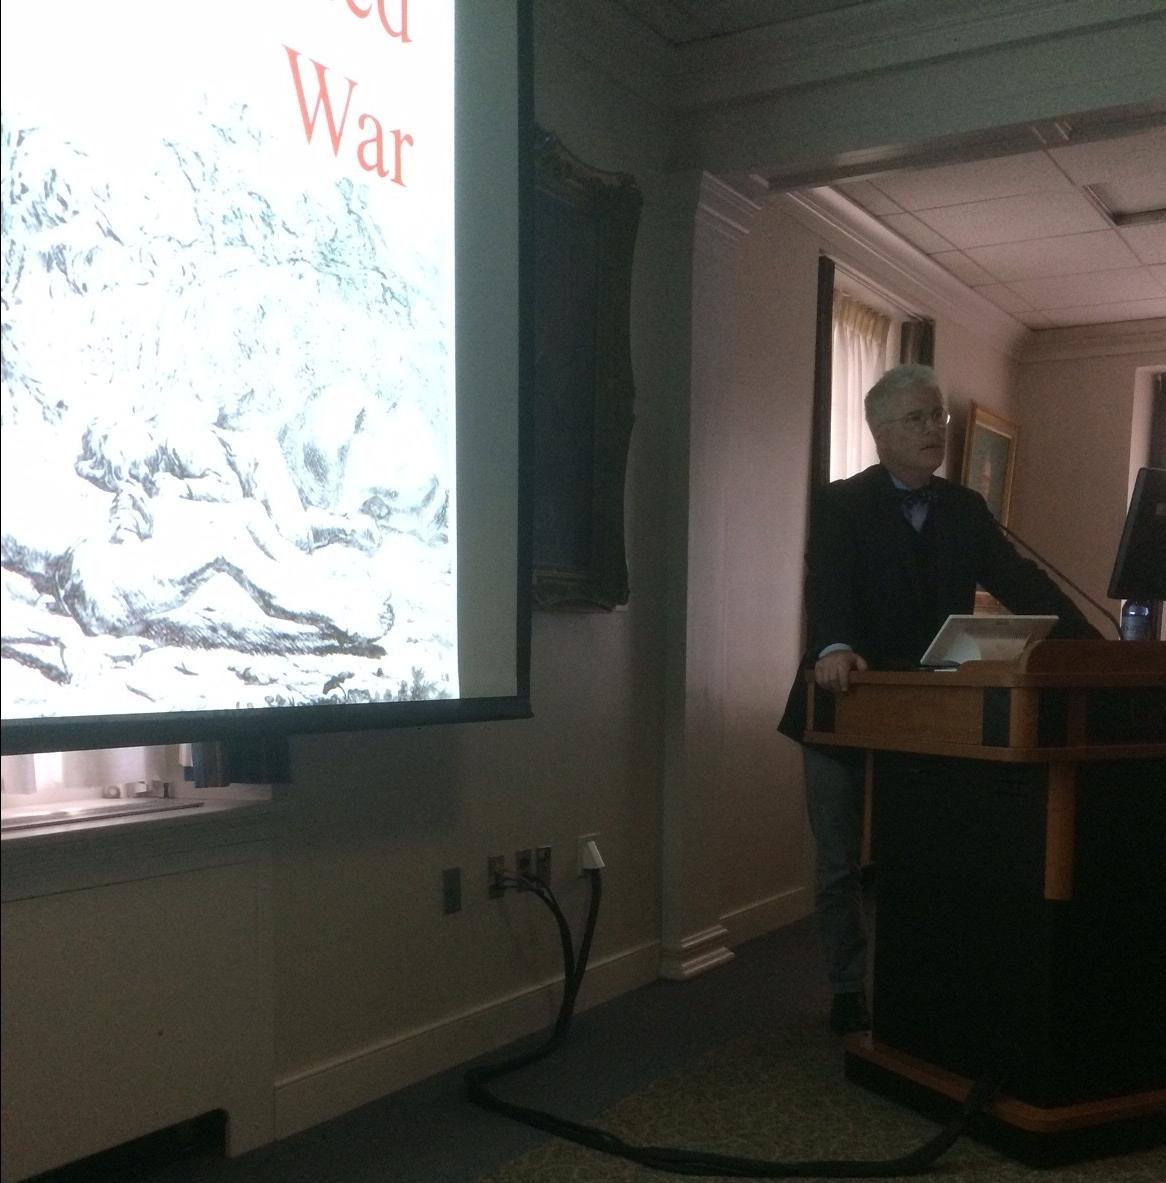 Understanding the True Nature of War: Dr. James Clifton's Lecture Mediated War